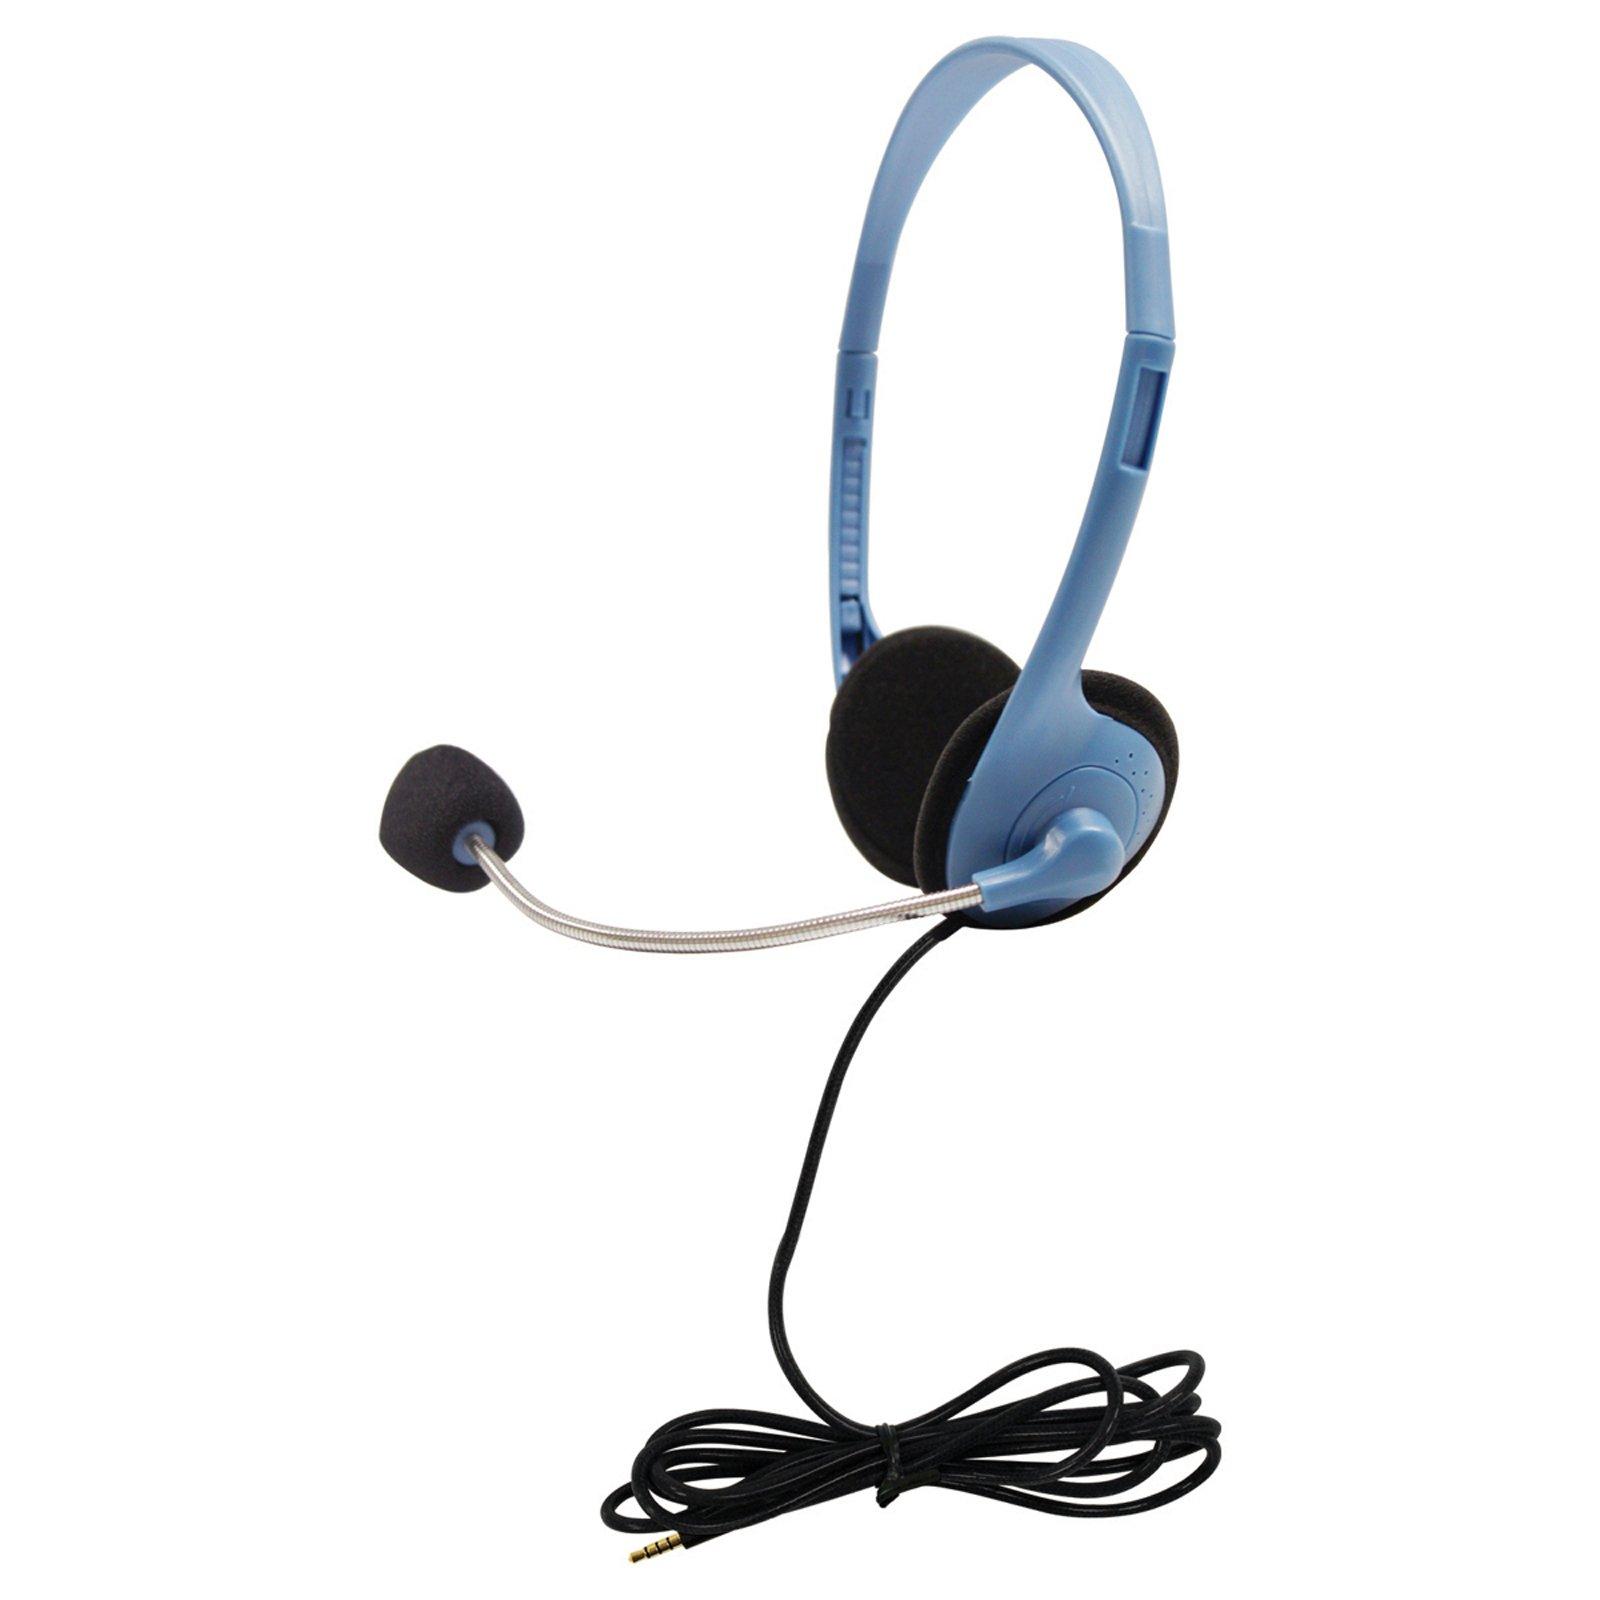 Hamilton Buhl Personal Headset with Gooseneck Mic and TRRS Plug